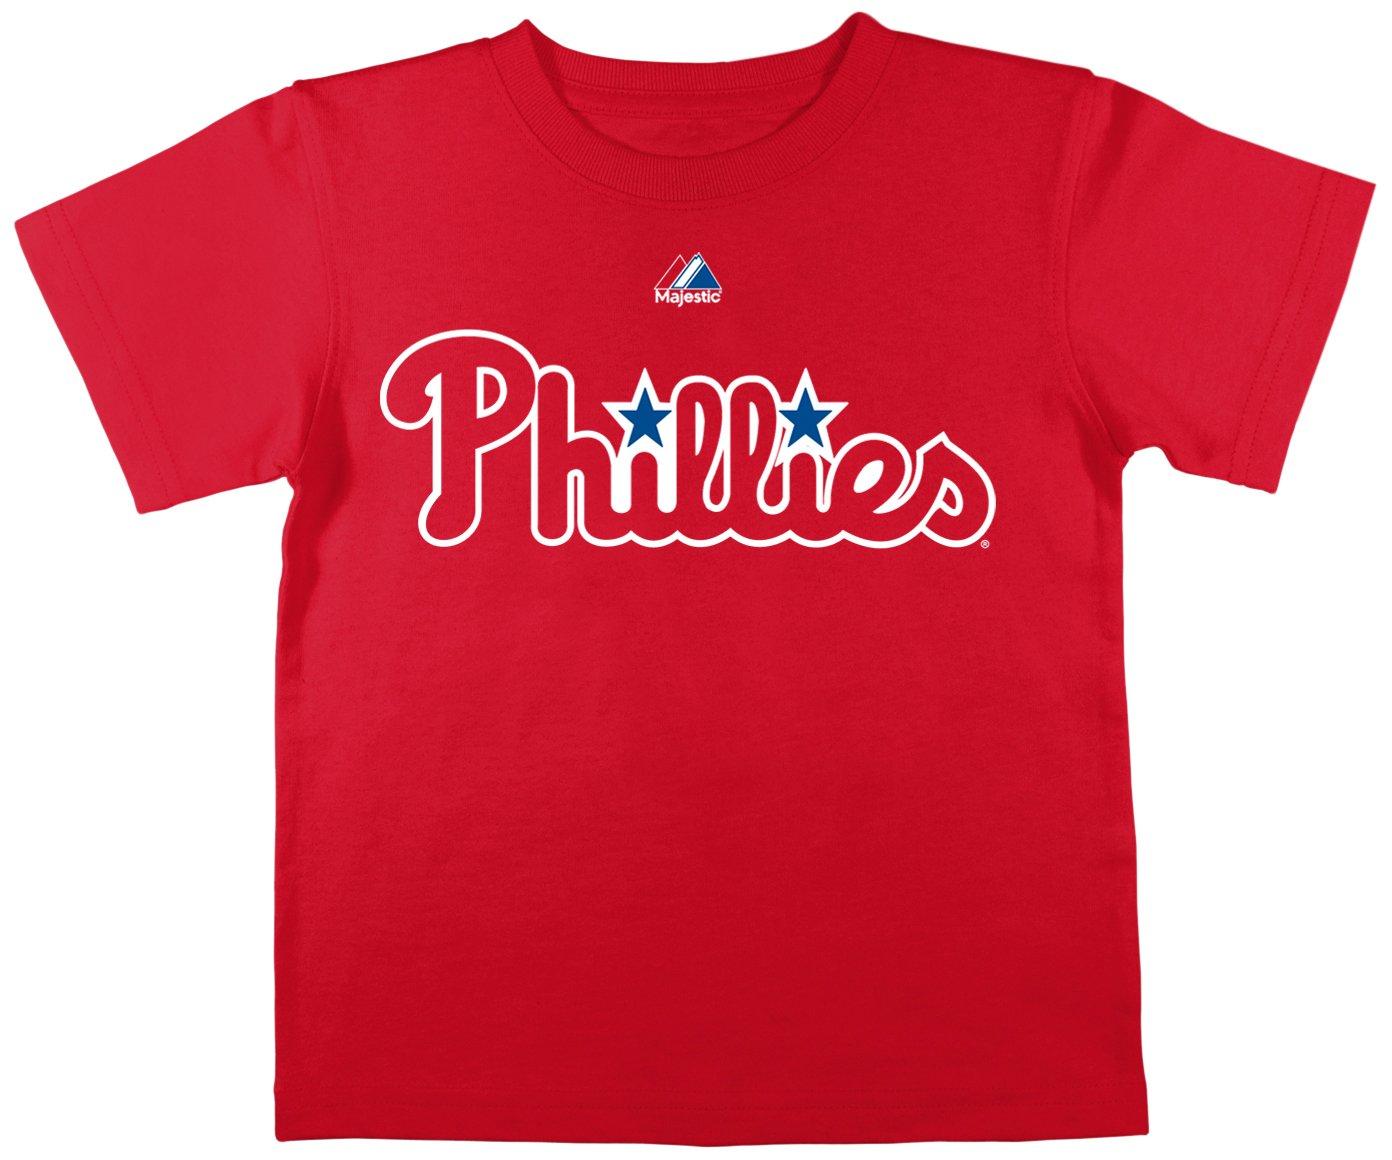 MLB Phillies Philadelphia Boy Phillies Boy 'sコールハメルズT、レッド、スモール MLB B00FOLG9ZU, グローブ湯もみ ナカムラスポーツ:0d445575 --- malebeauty.xyz